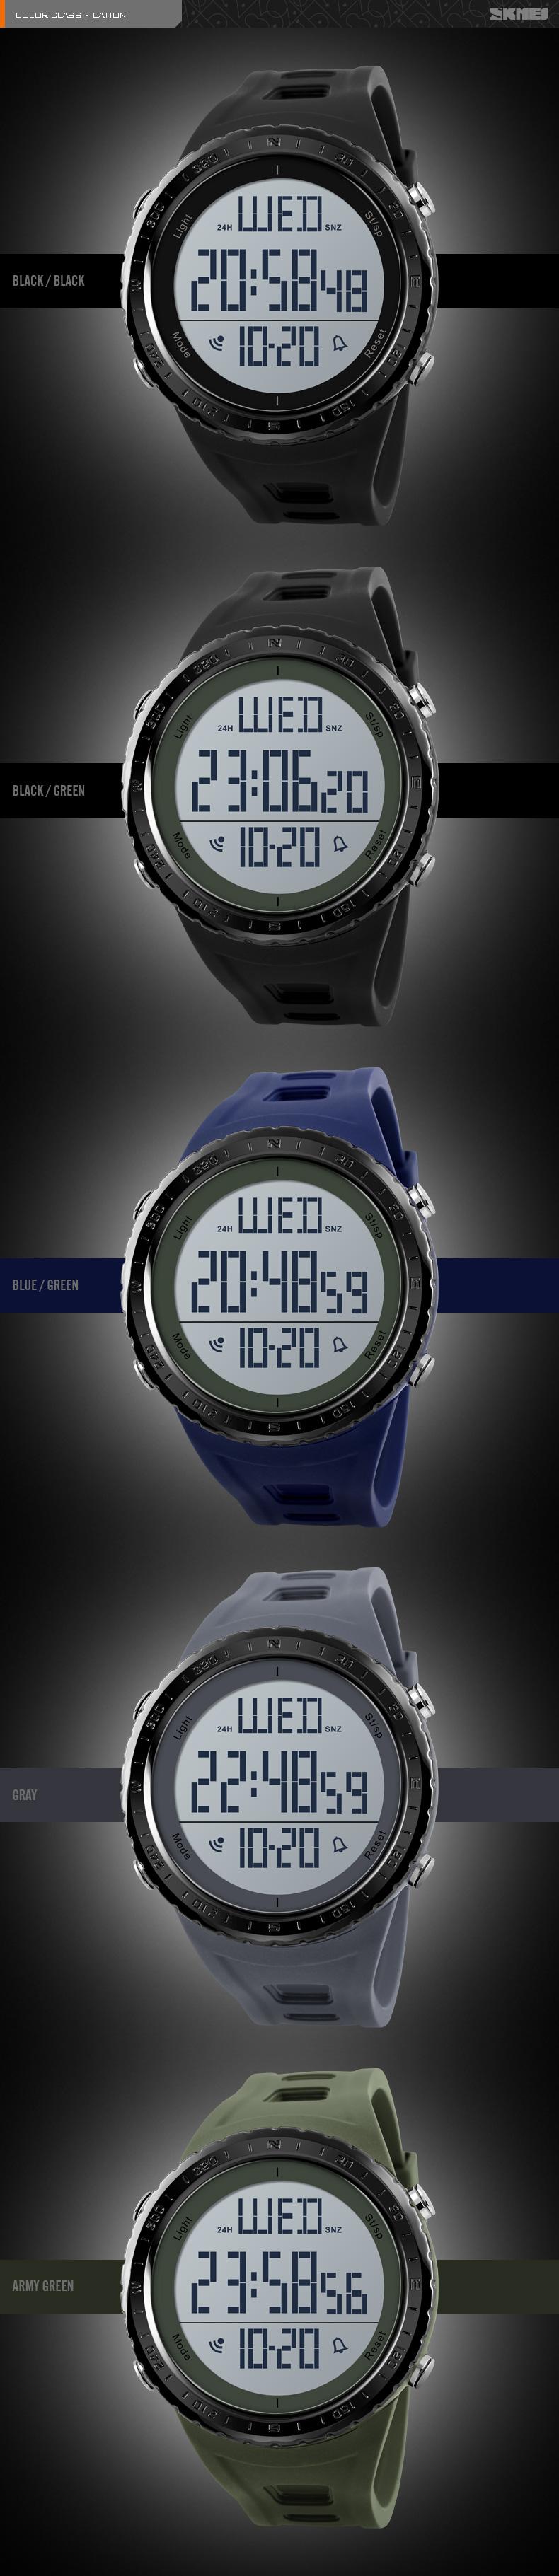 SKMEI 1310 Digital Watch Swimming Sport Fashion Back Light LED Men Wrist Watch